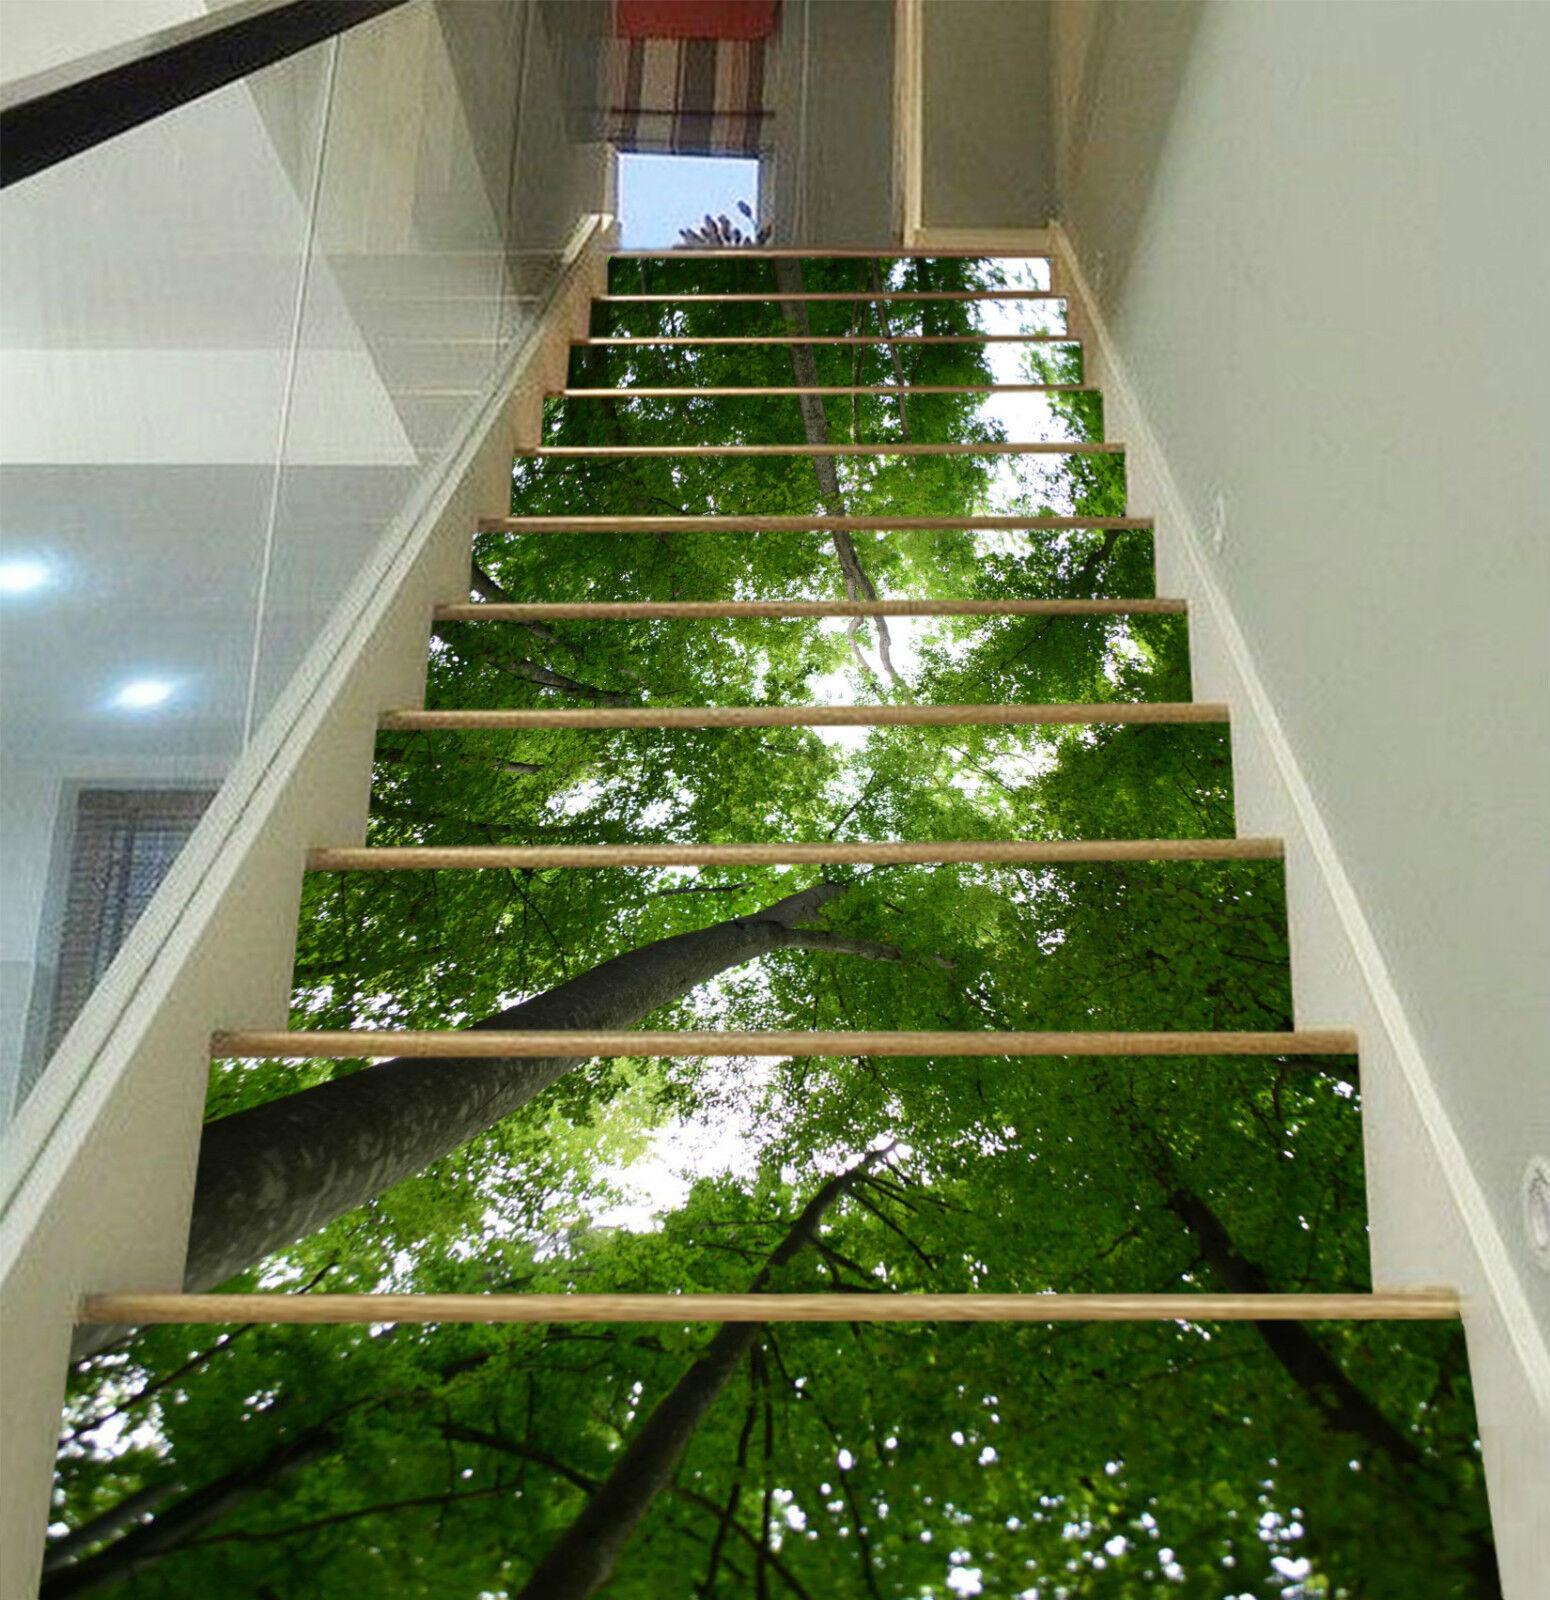 3D Grn Baum 6944 Stair Risers Dekoration Fototapete Vinyl Aufkleber Tapete DE